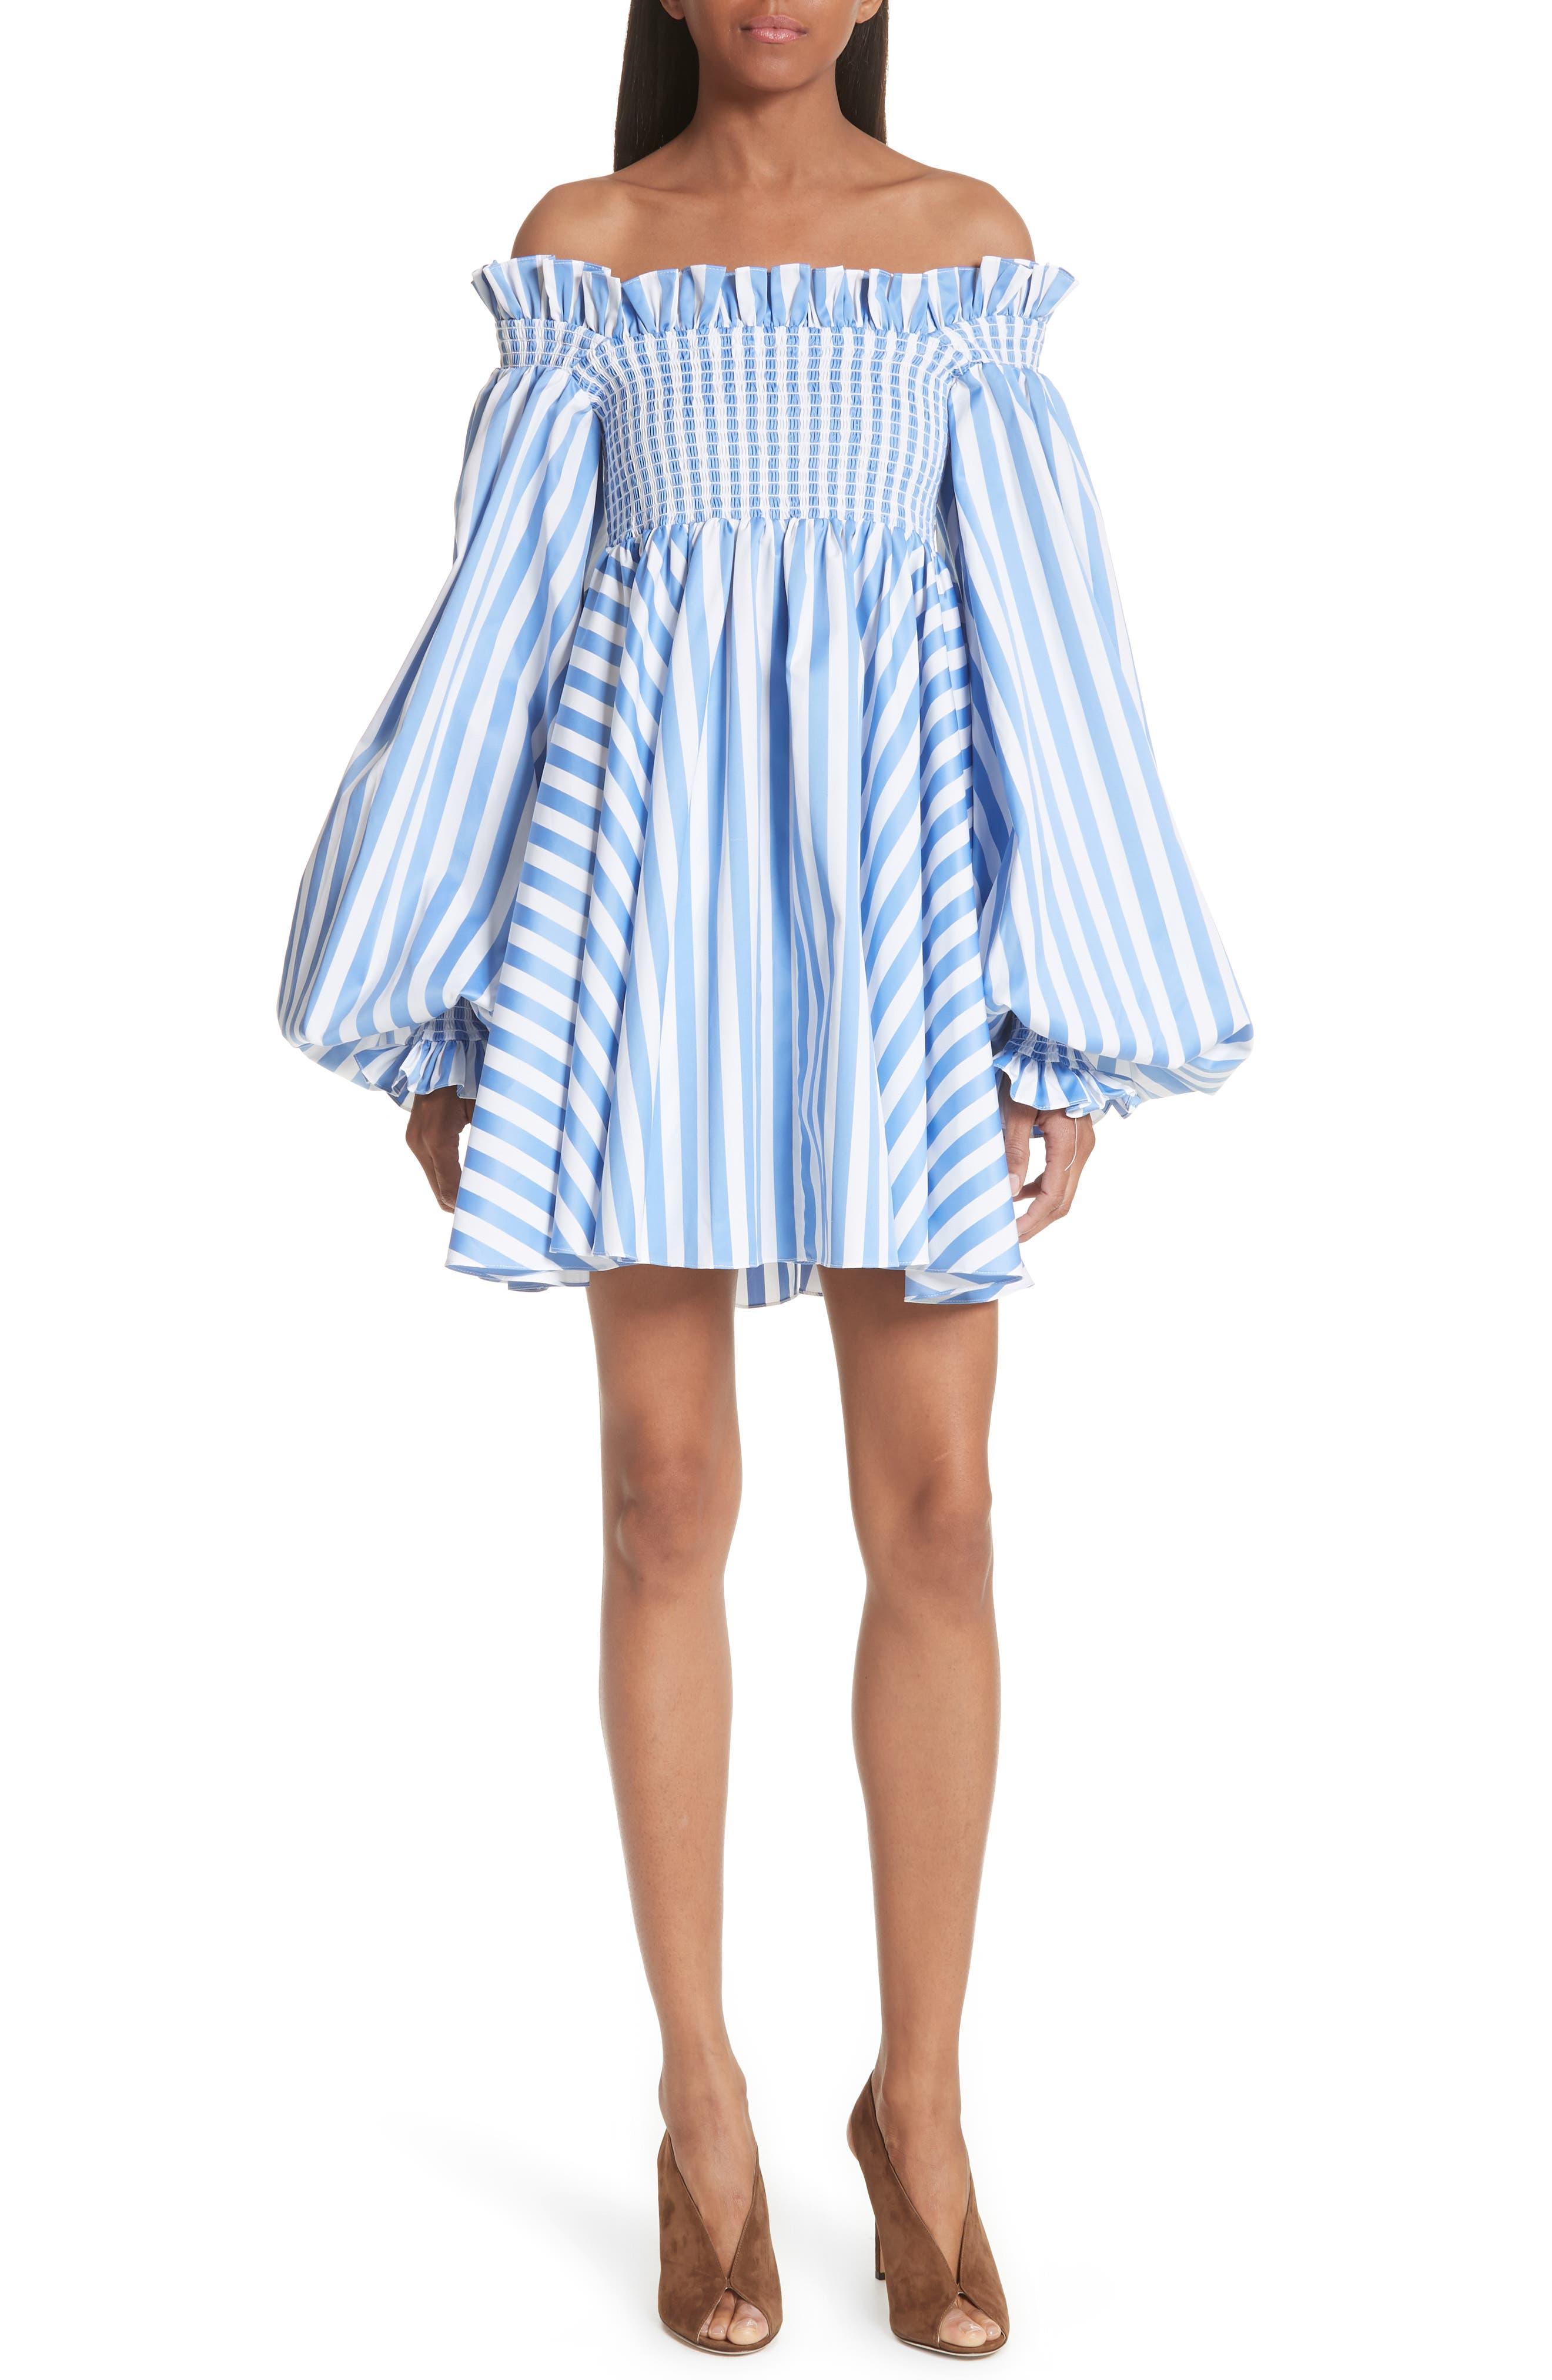 Kora Stripe Off the Shoulder Dress,                             Main thumbnail 1, color,                             Blue/ White